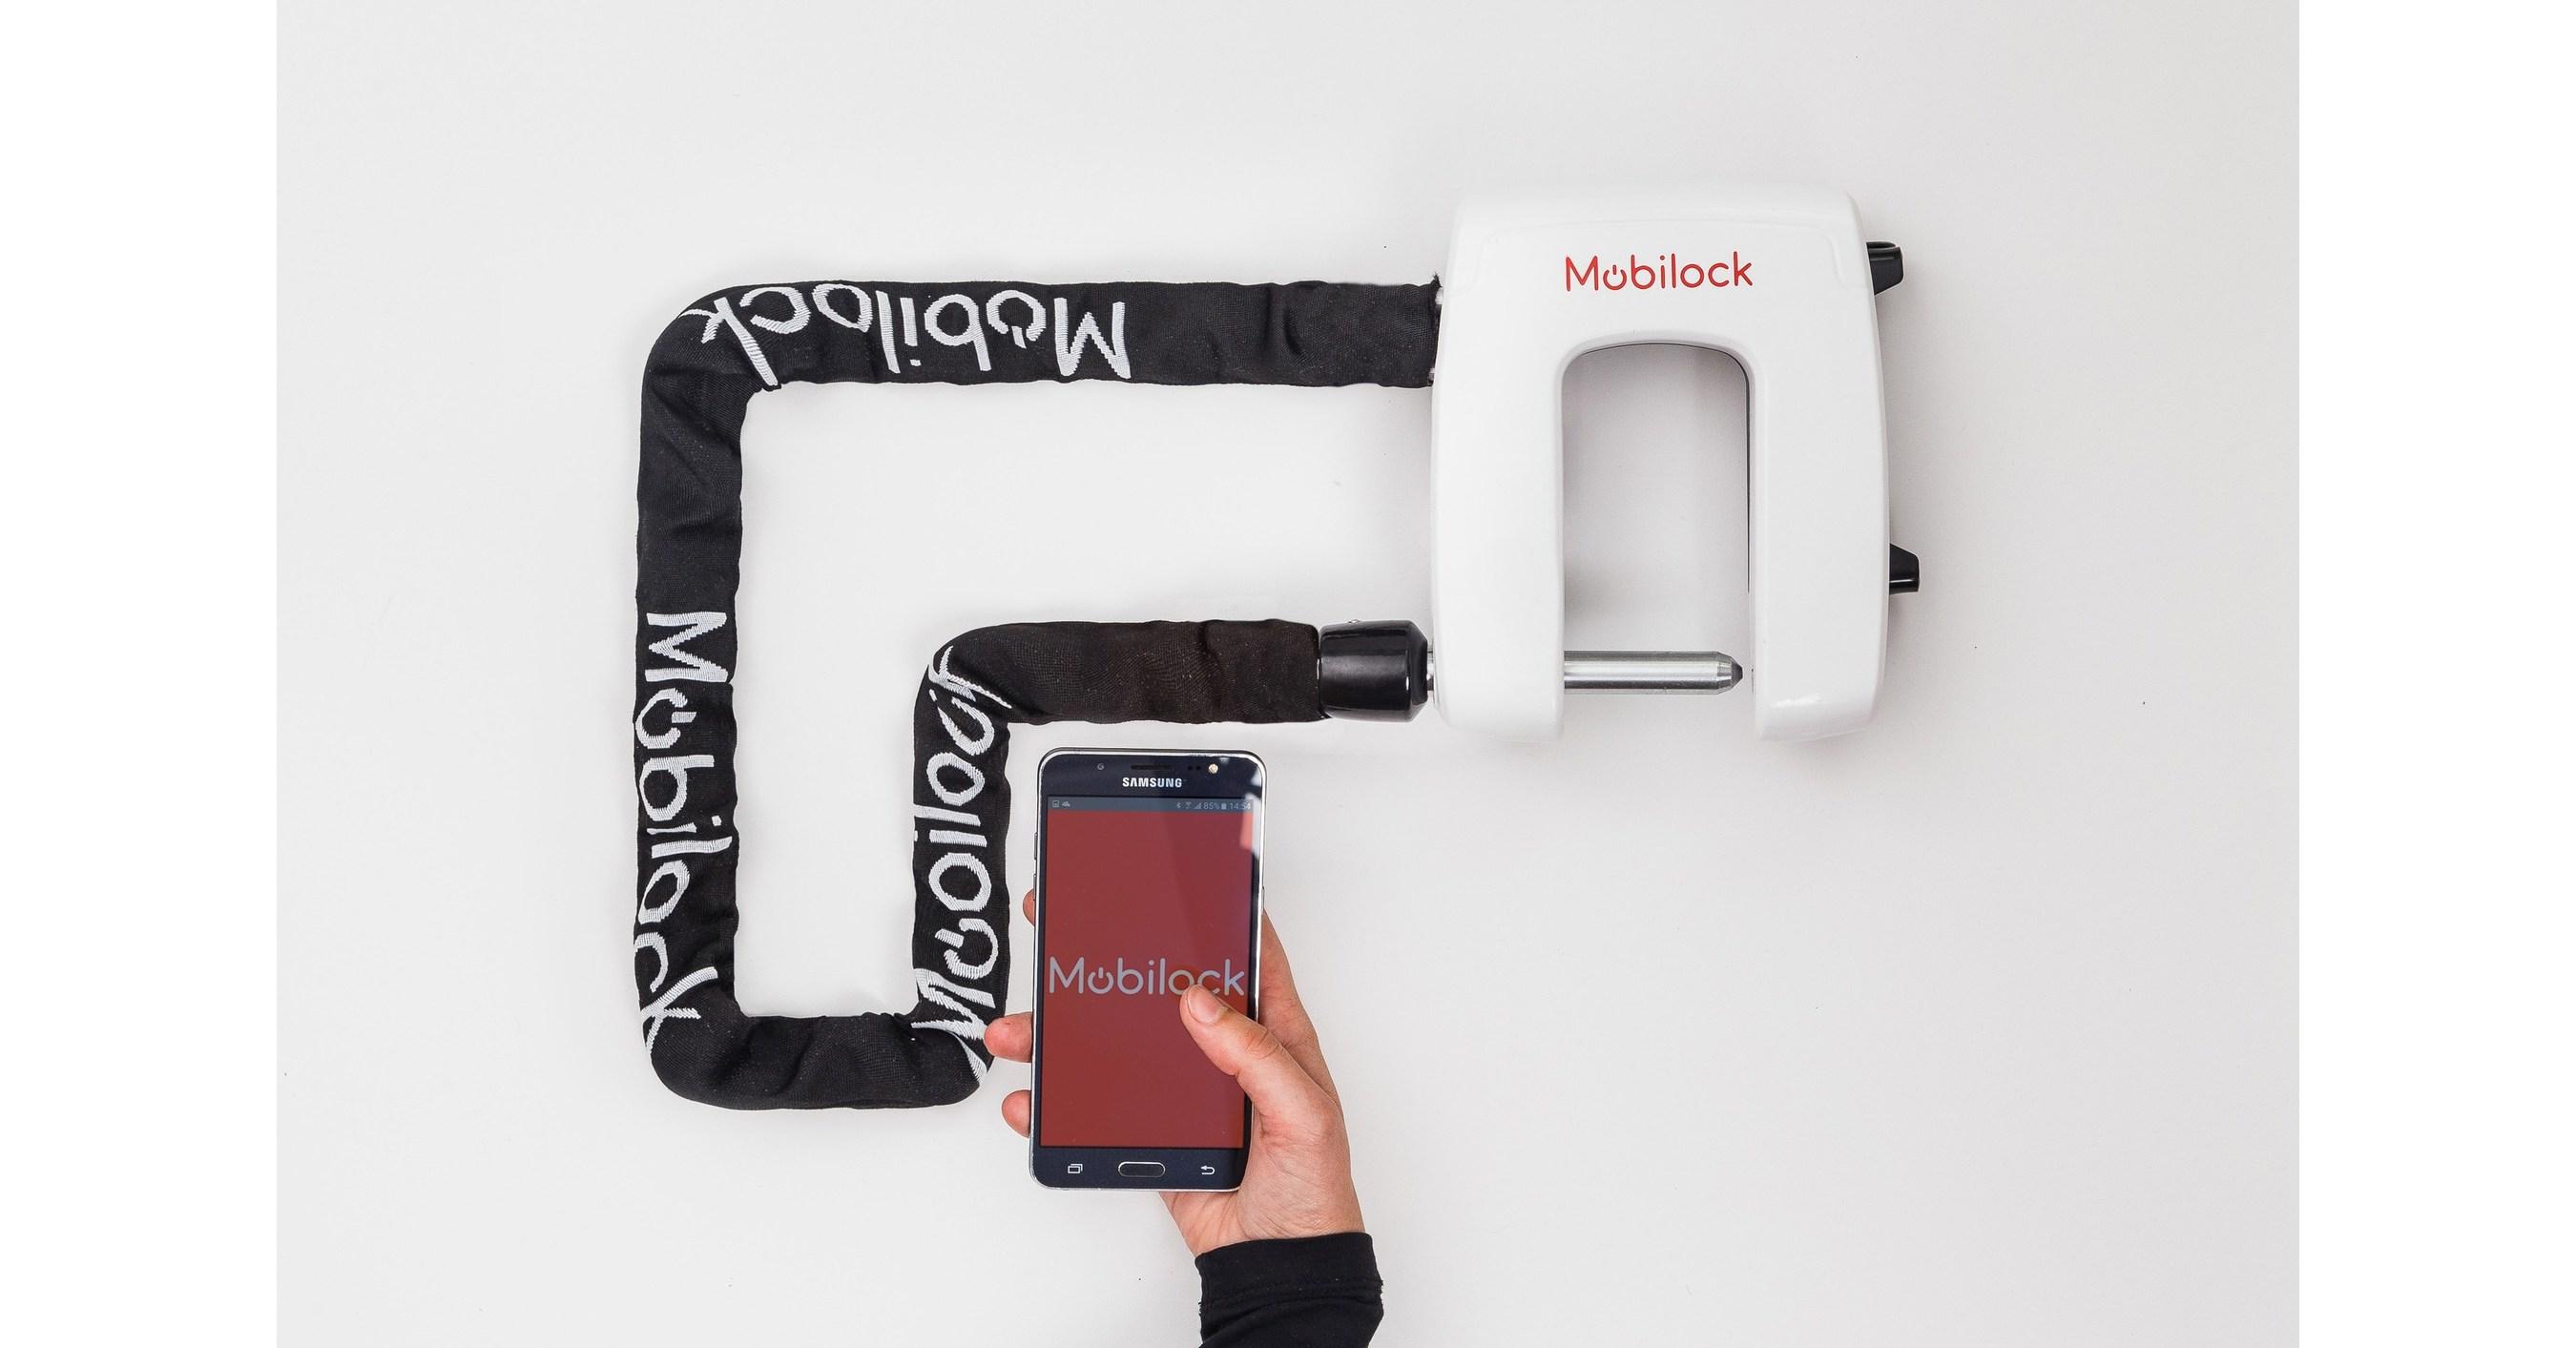 mobilock das sicherste elektronische fahrradschloss der welt. Black Bedroom Furniture Sets. Home Design Ideas